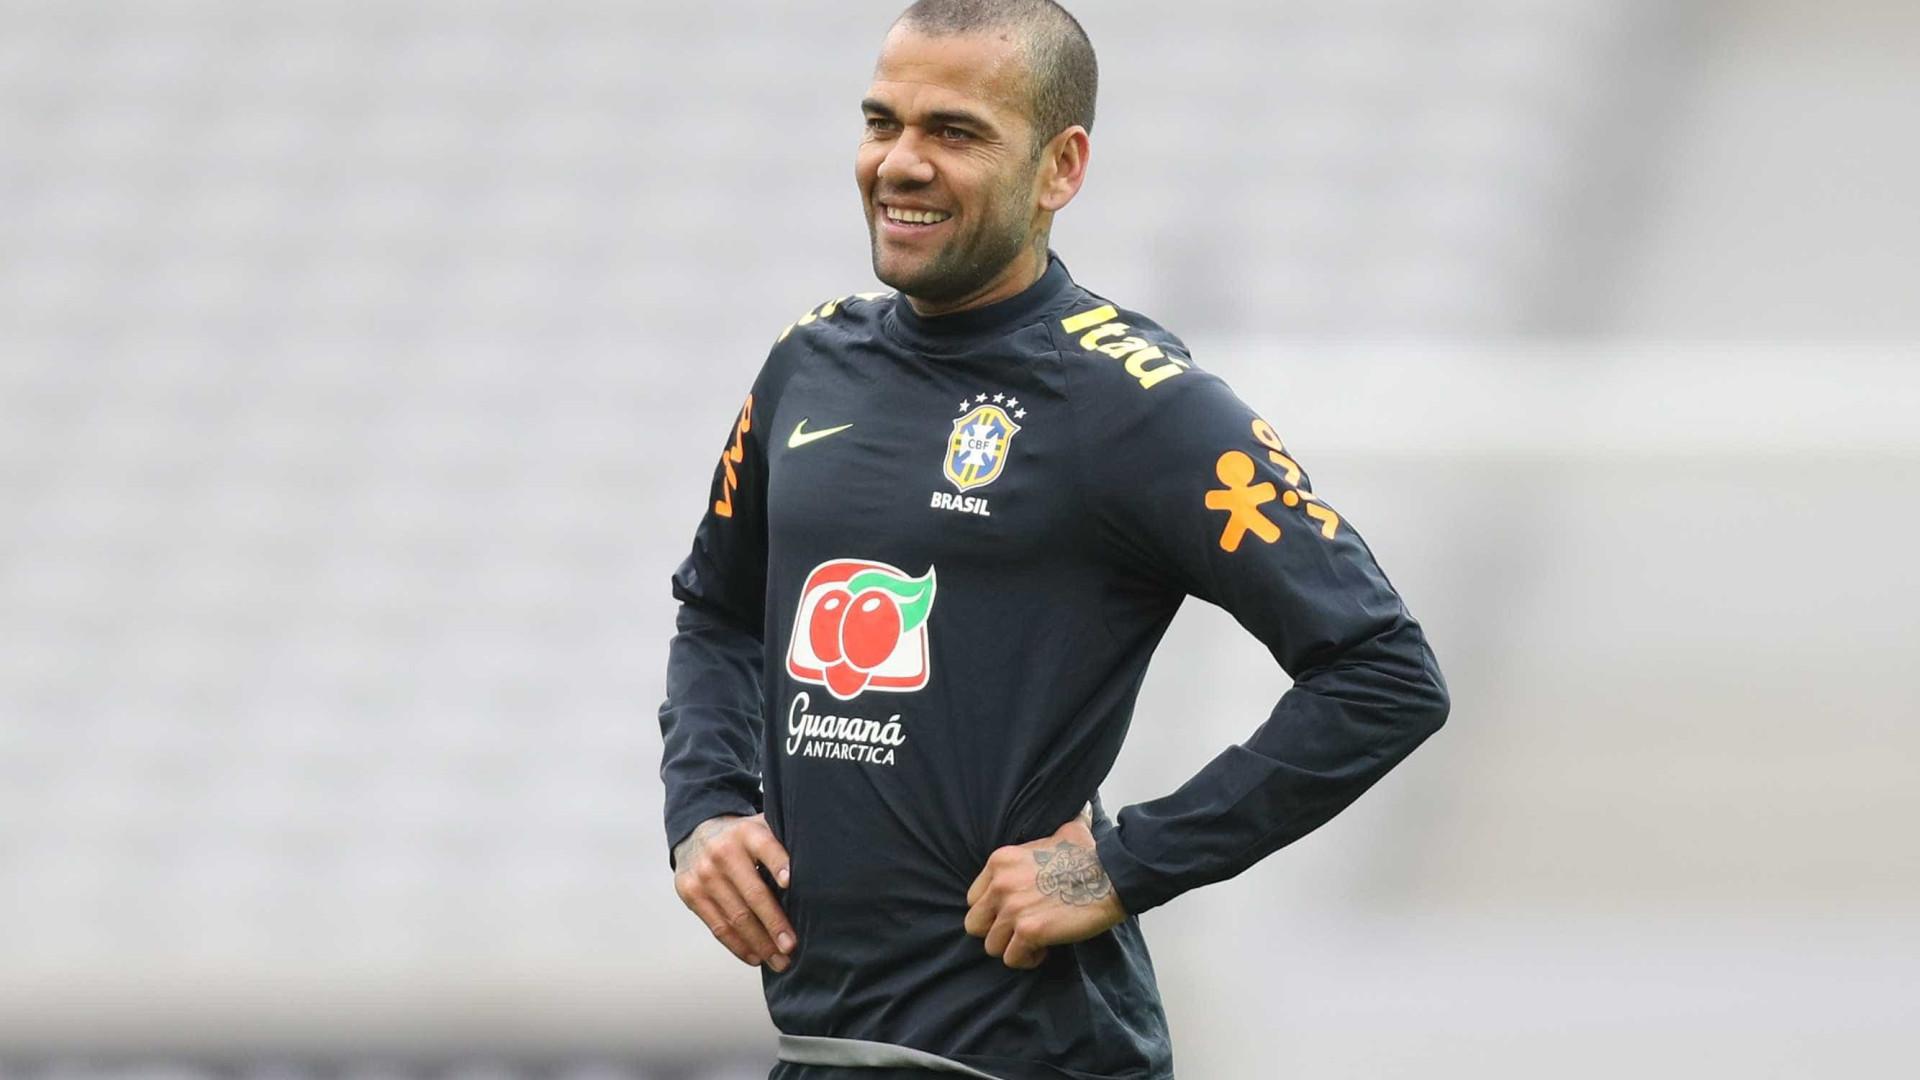 Paris Saint-Germain confirma que Dani Alves passará por cirurgia